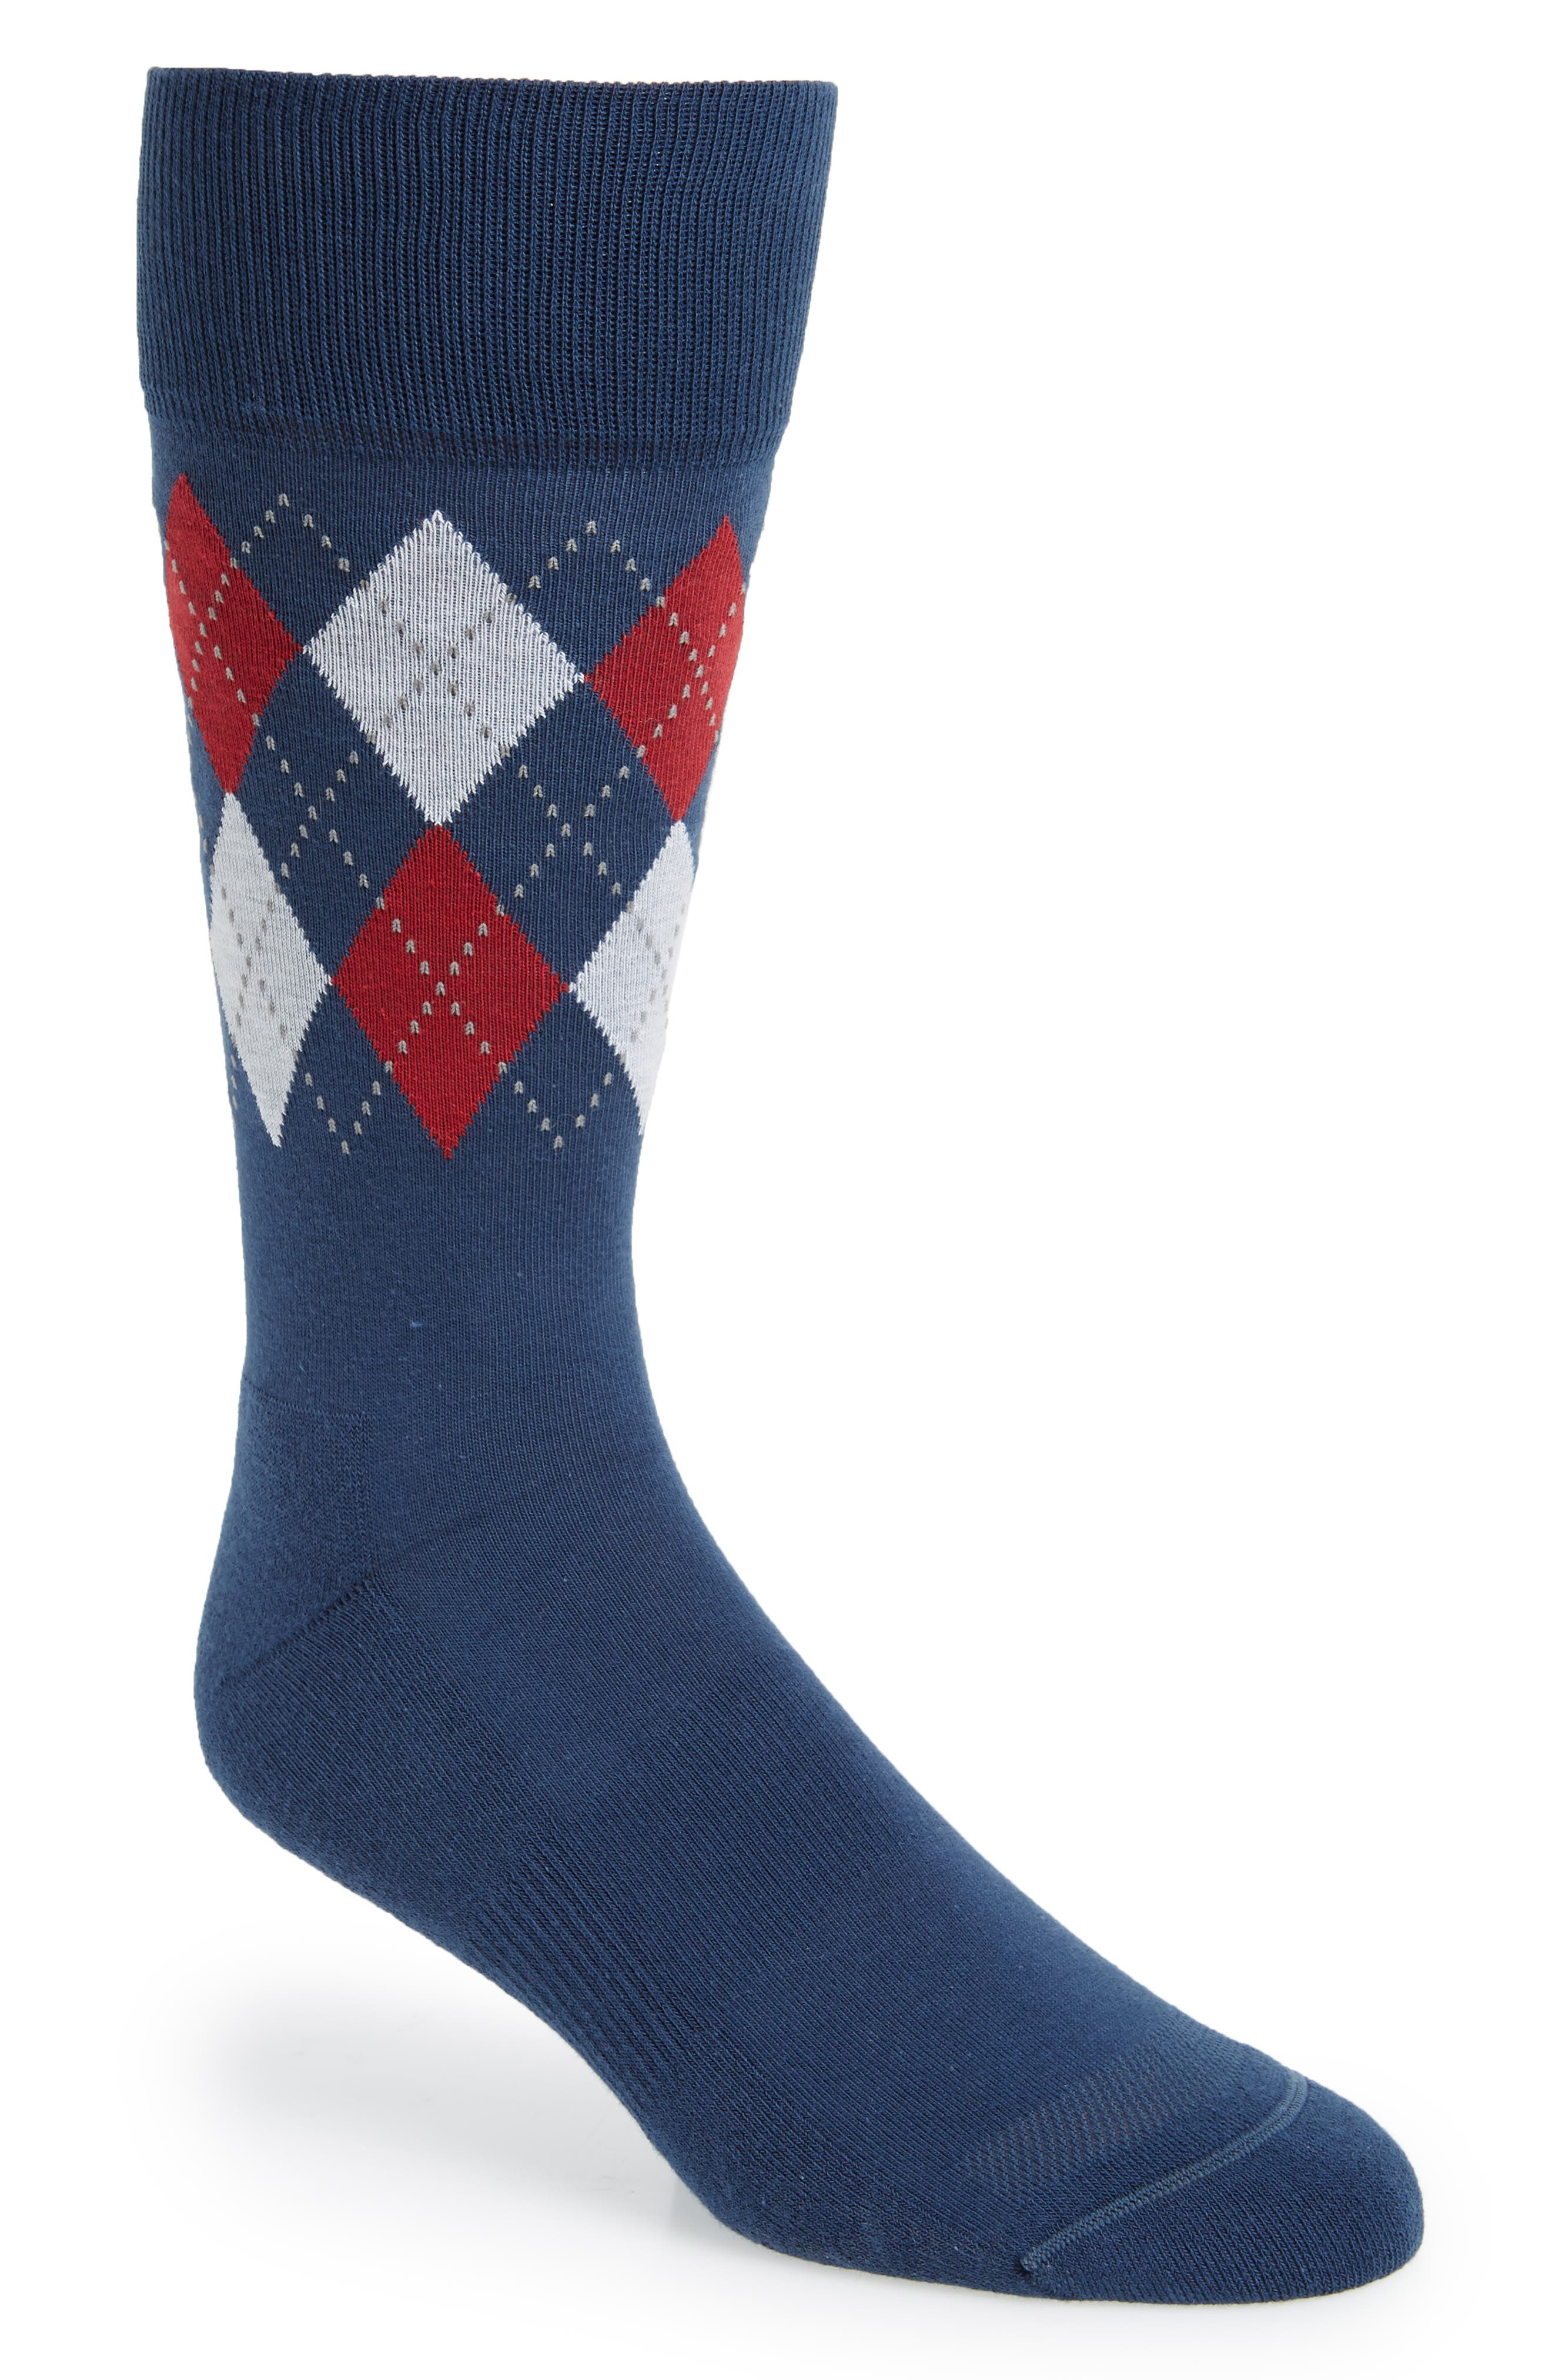 Argyle Band Socks,                         Main,                         color, Red/ White/ Blue